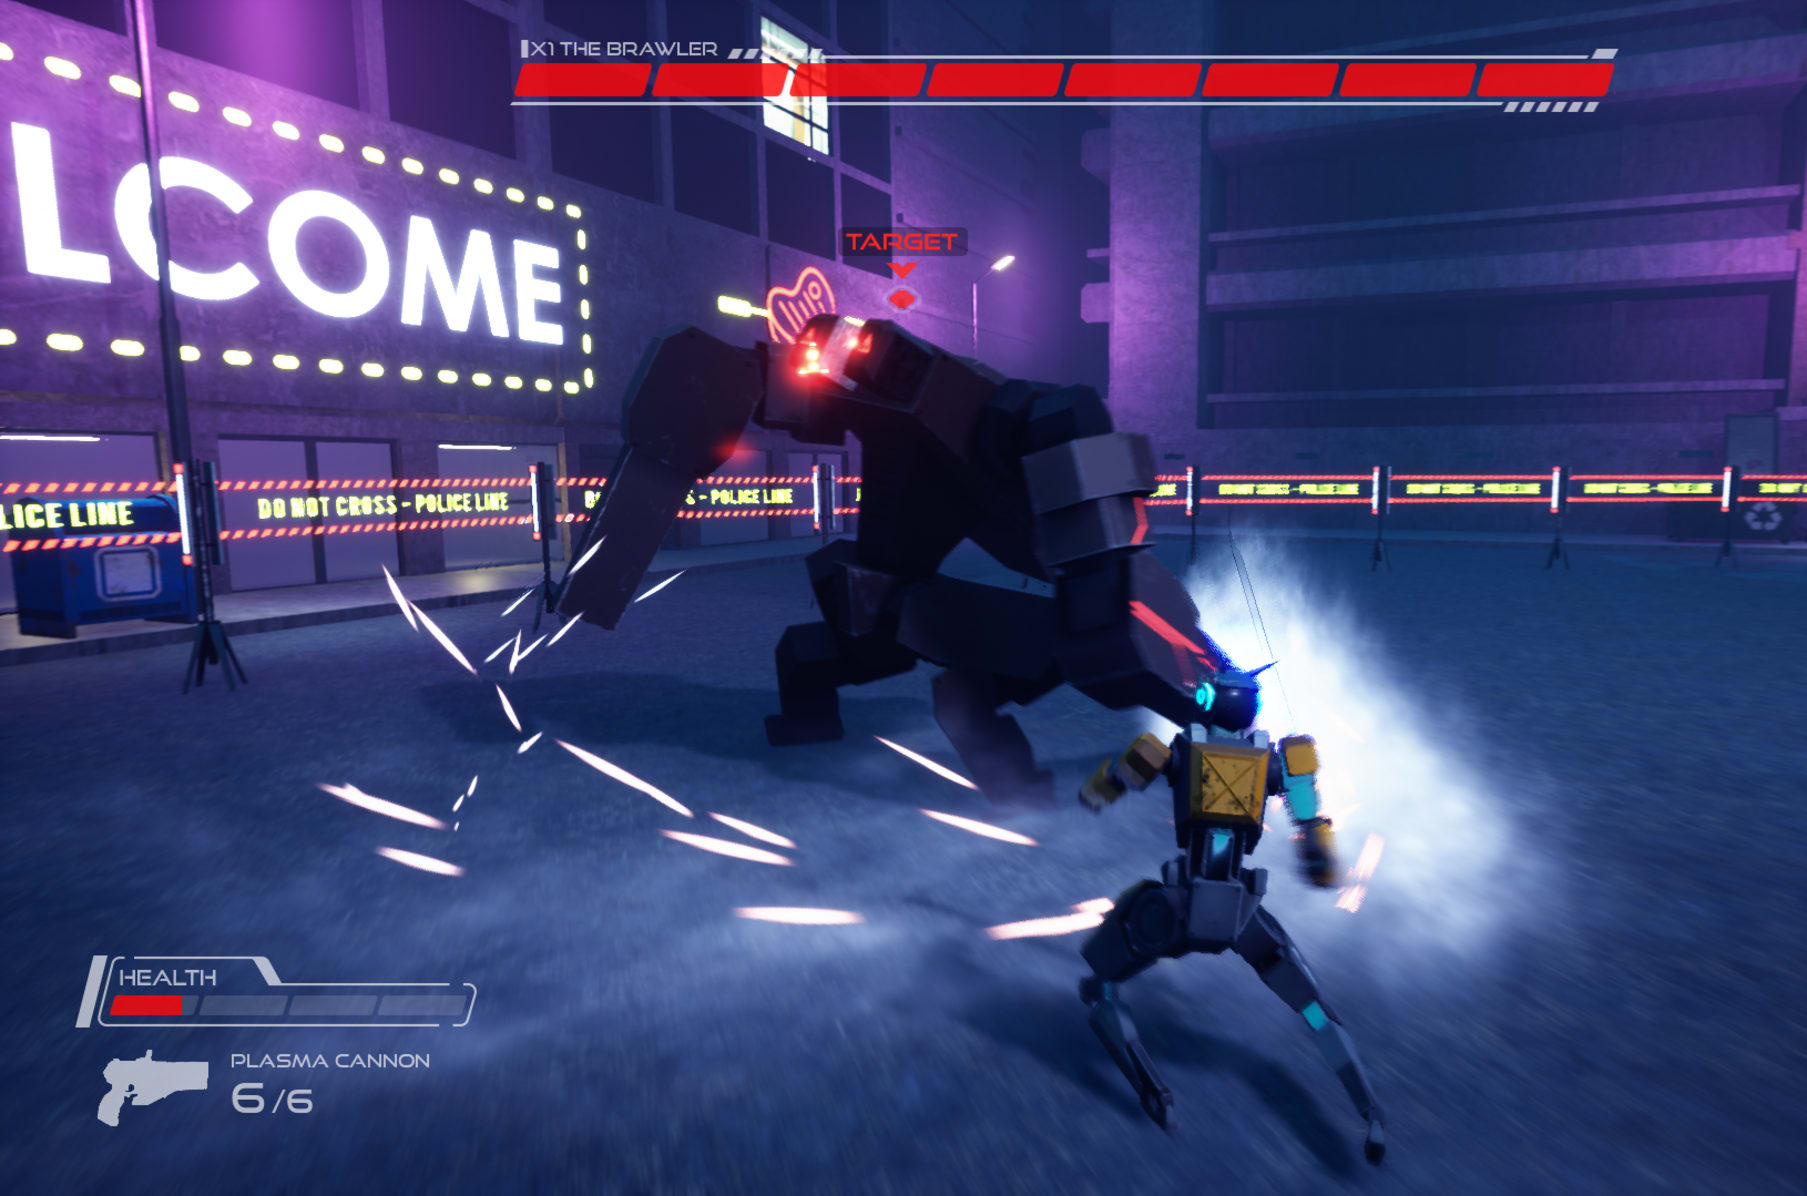 Proto-G, A Futuristic Robot Hack and Slash PC Game | Indiegogo